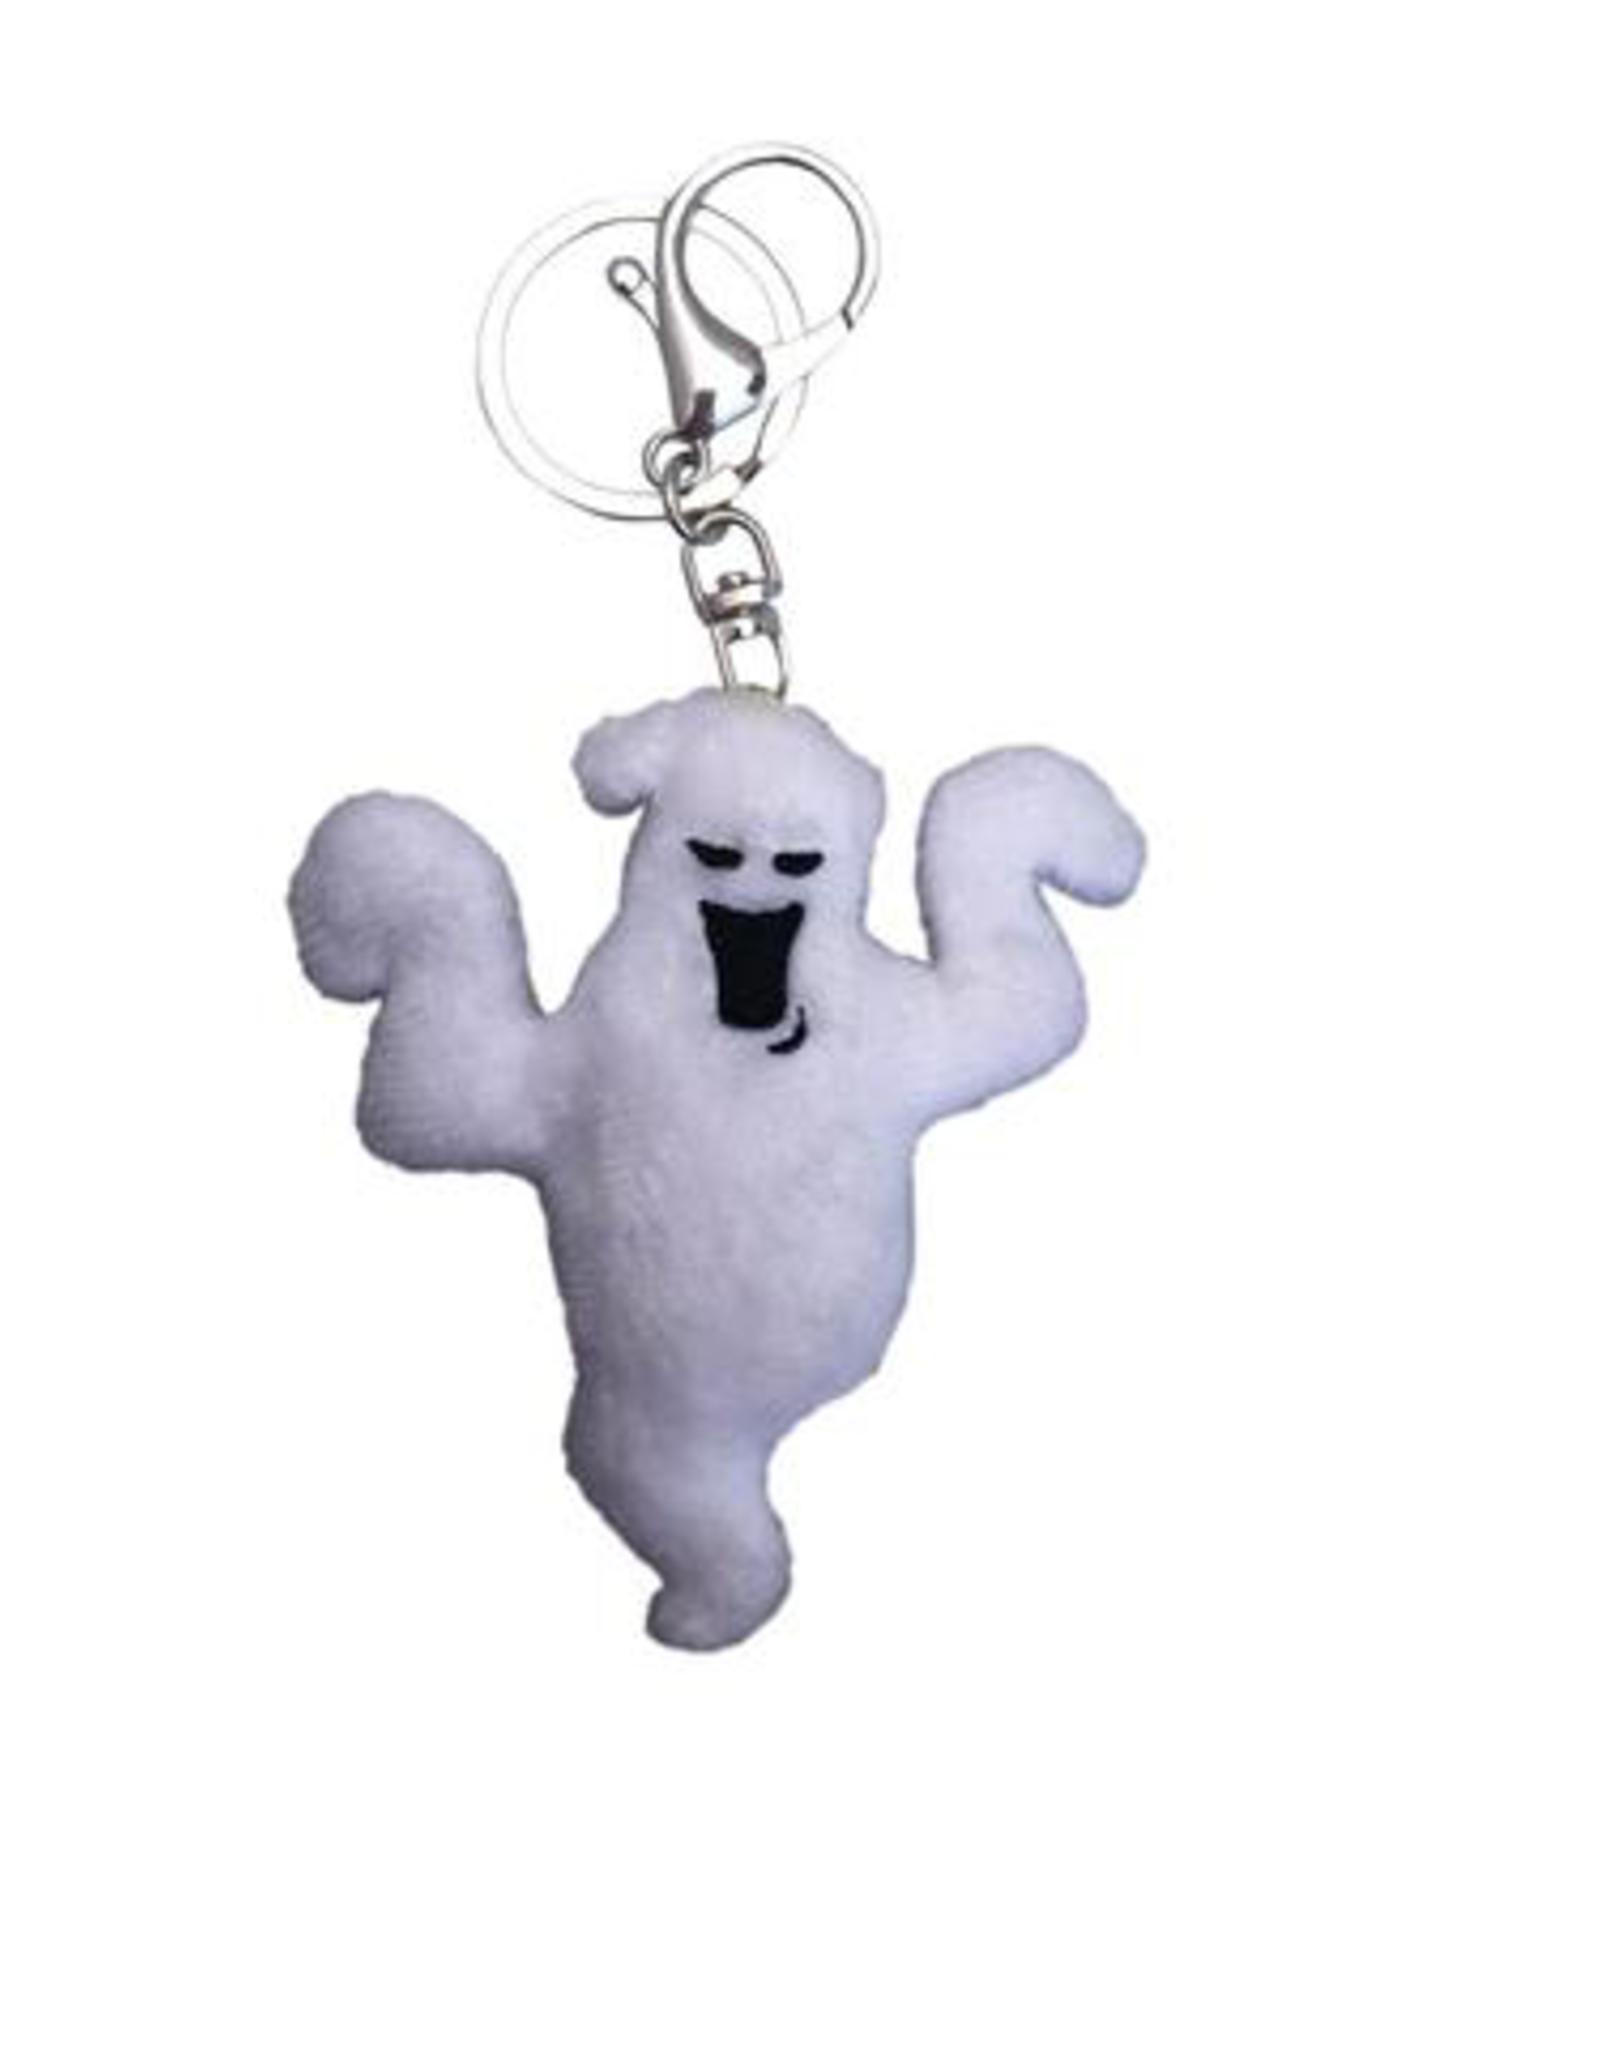 Boo Ghost Plush Keychain